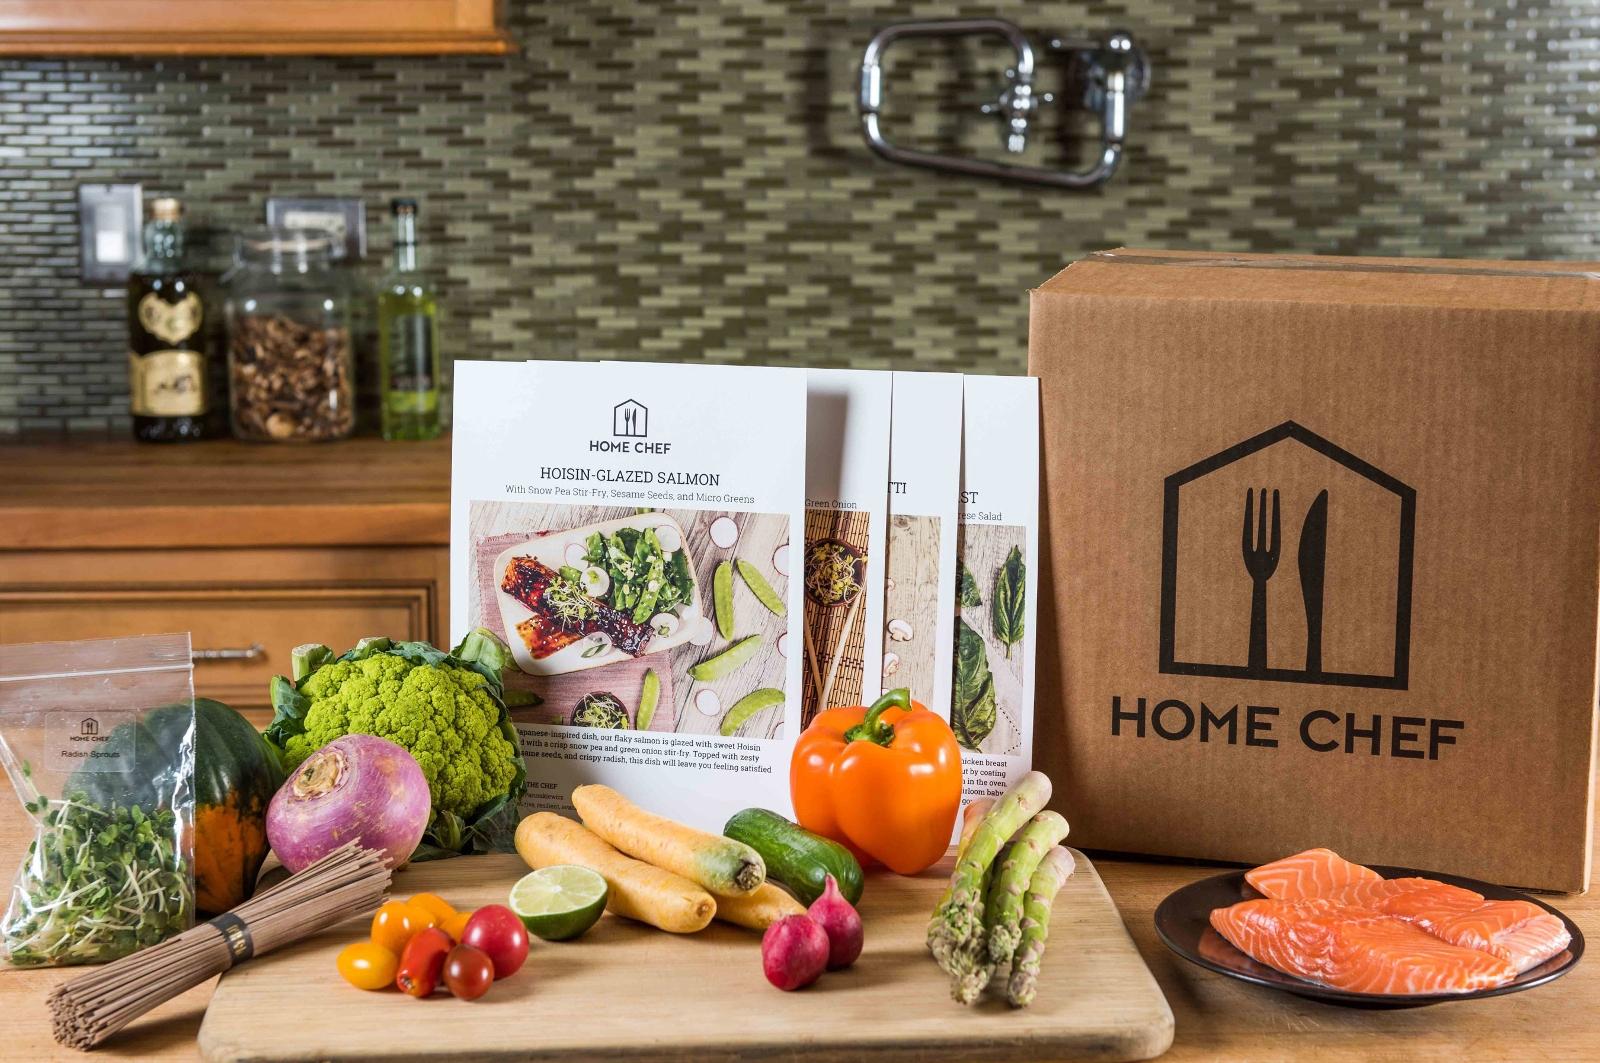 Swagbucks: 2-Standard Home Chef Meal Subscription + 3000 SB  $20